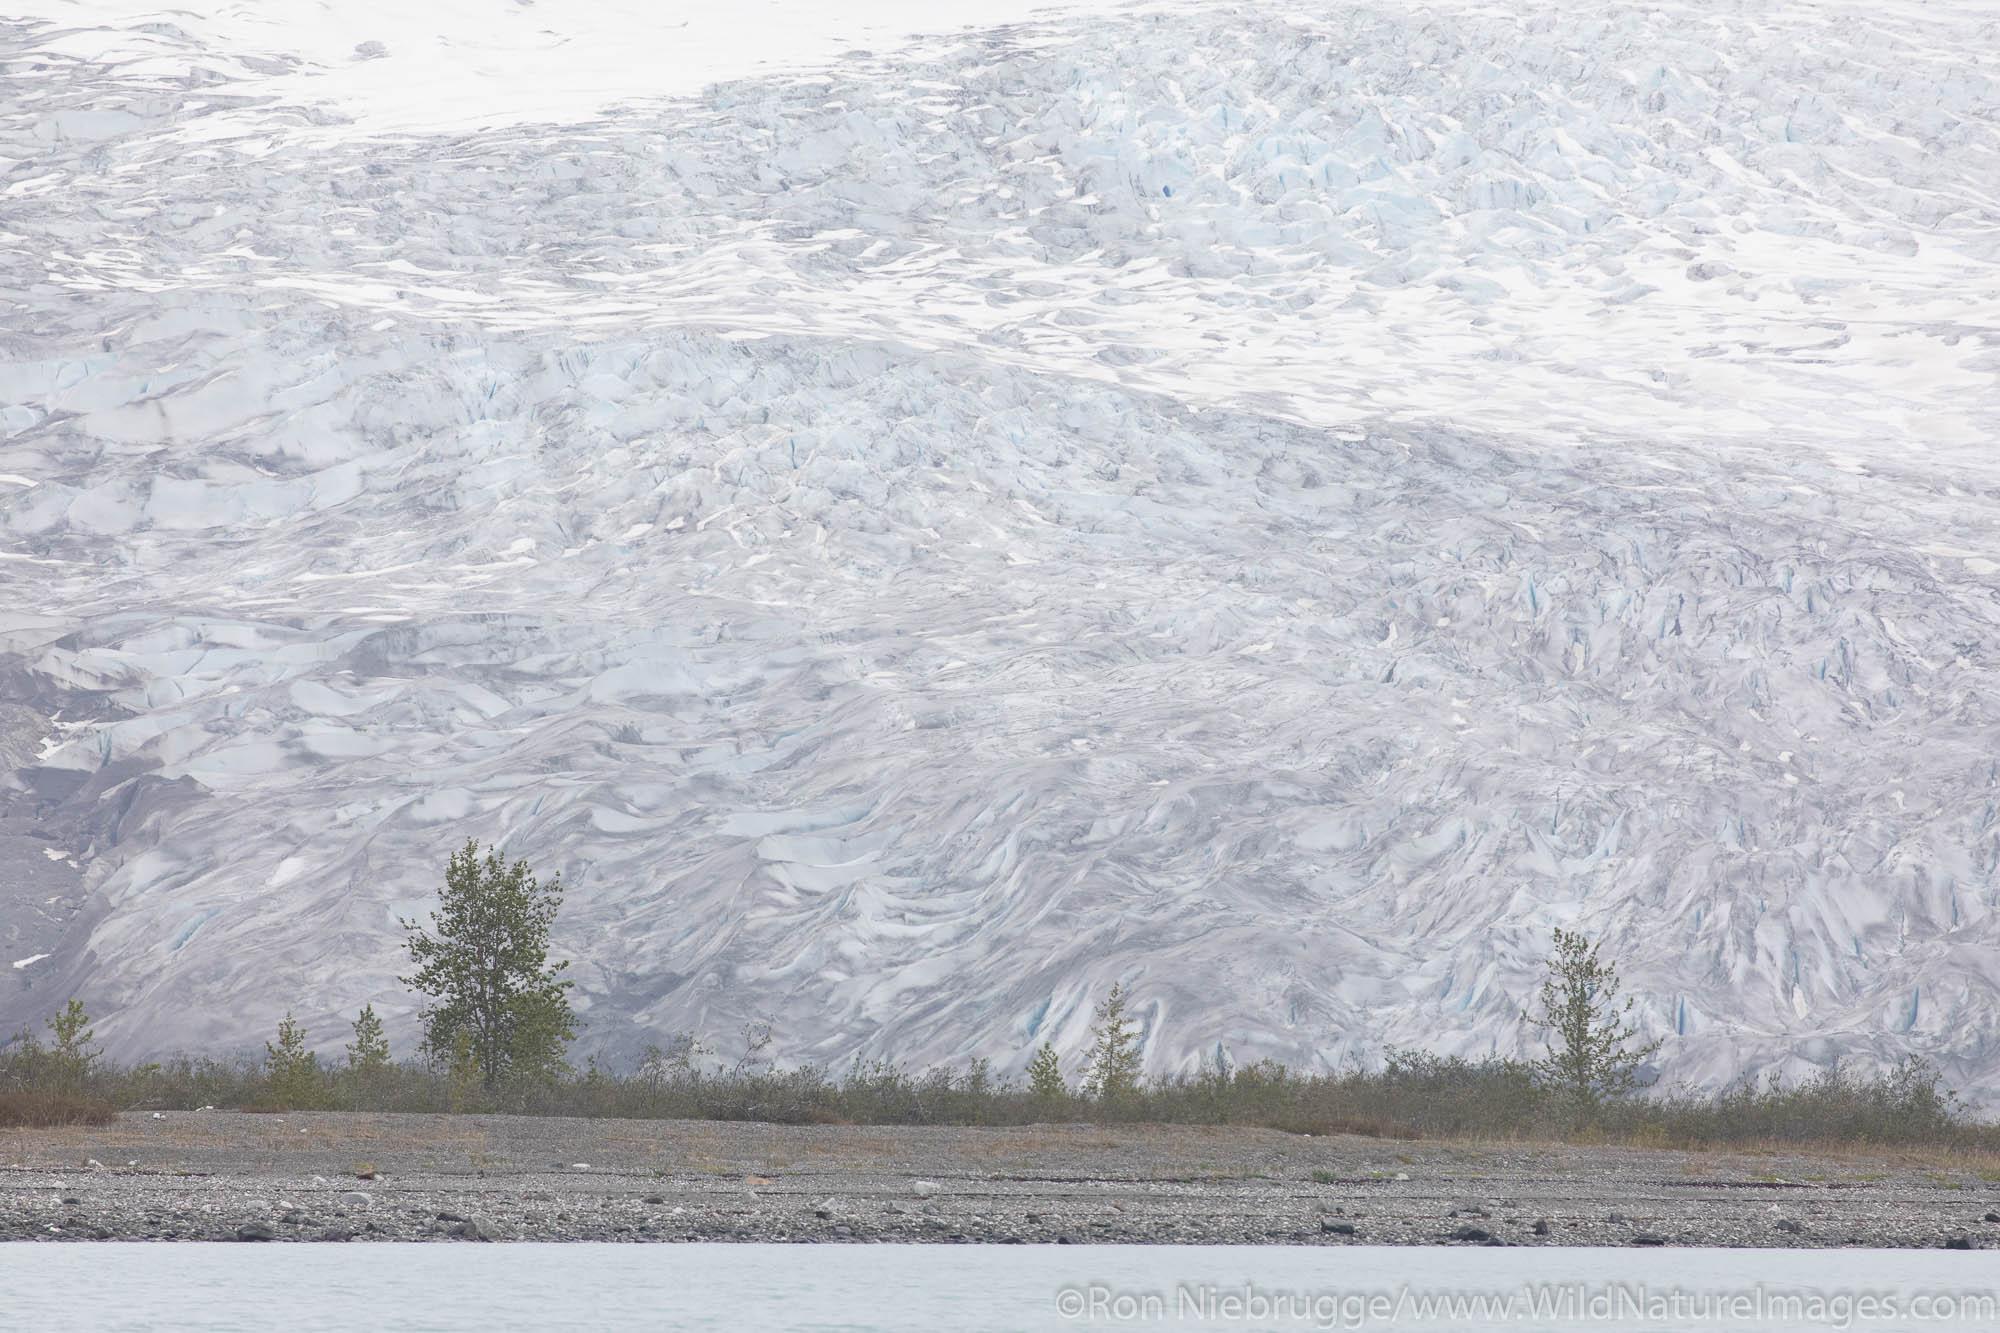 Reid Glaicer, Glacier Bay National Park, Alaska.